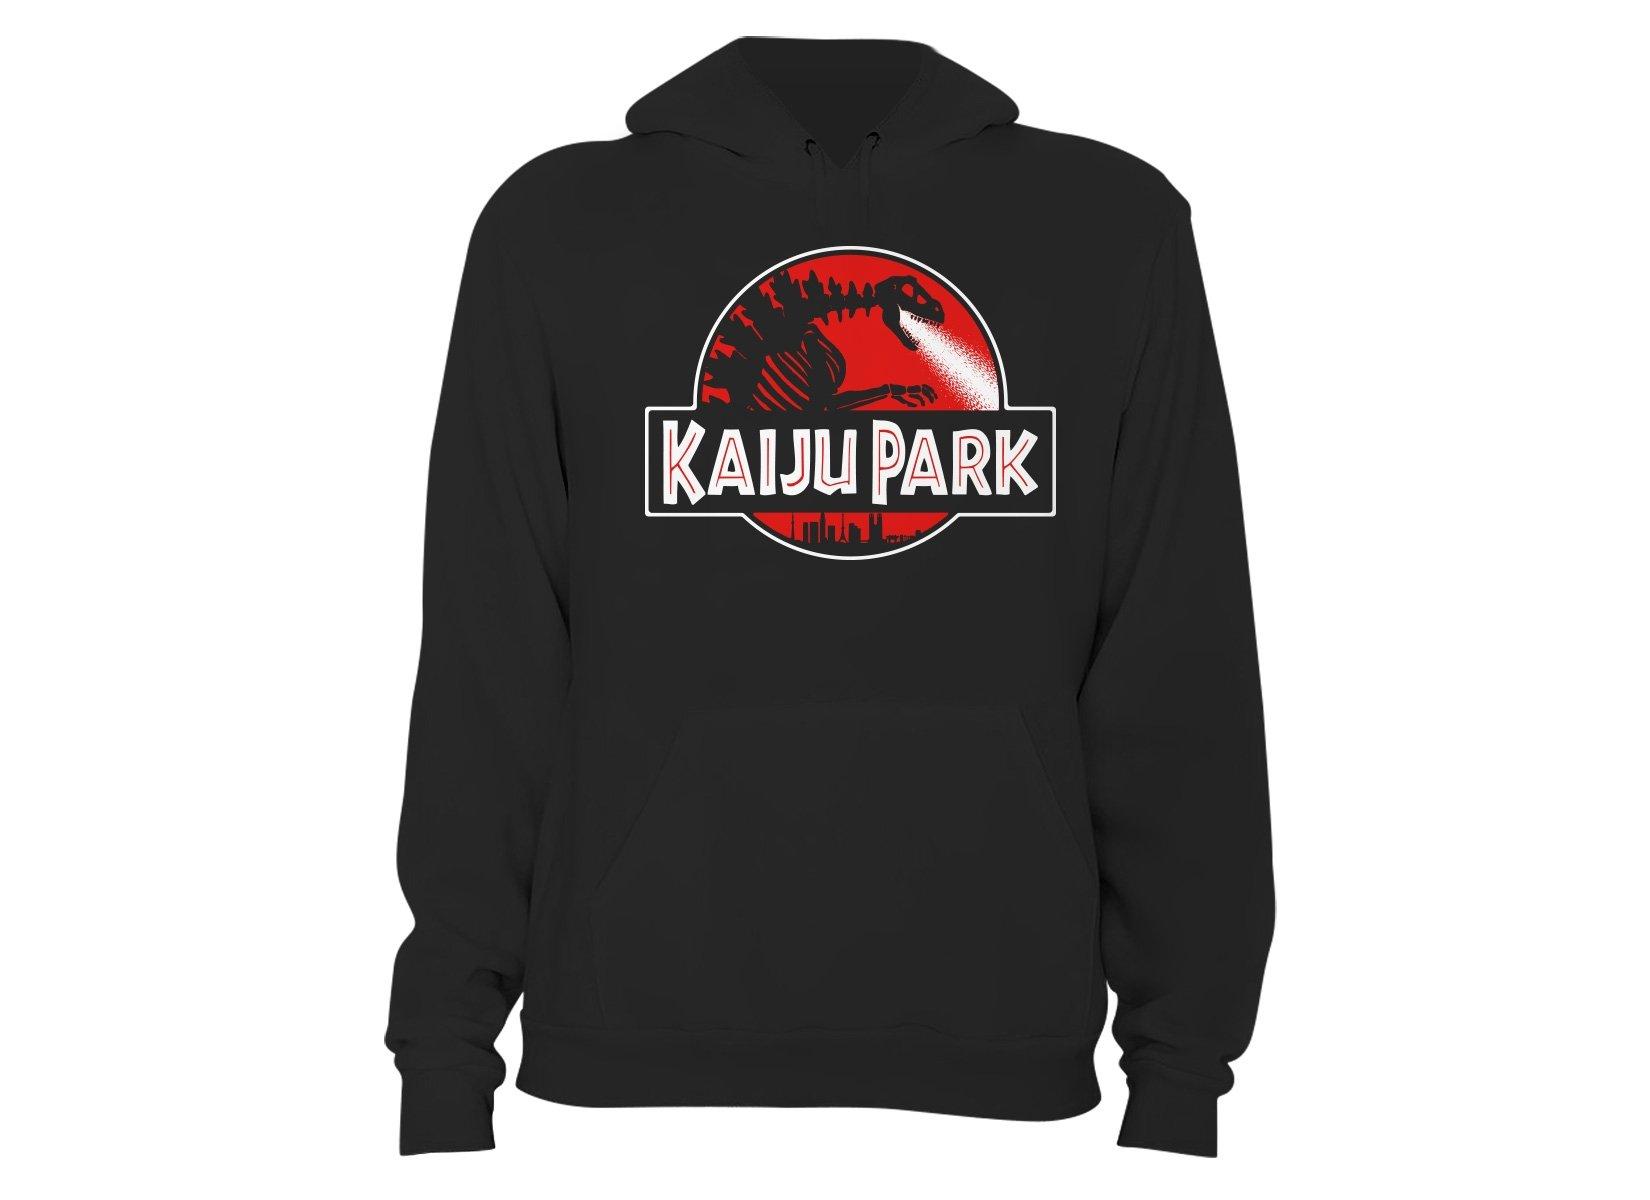 Kaiju Park on Hoodie